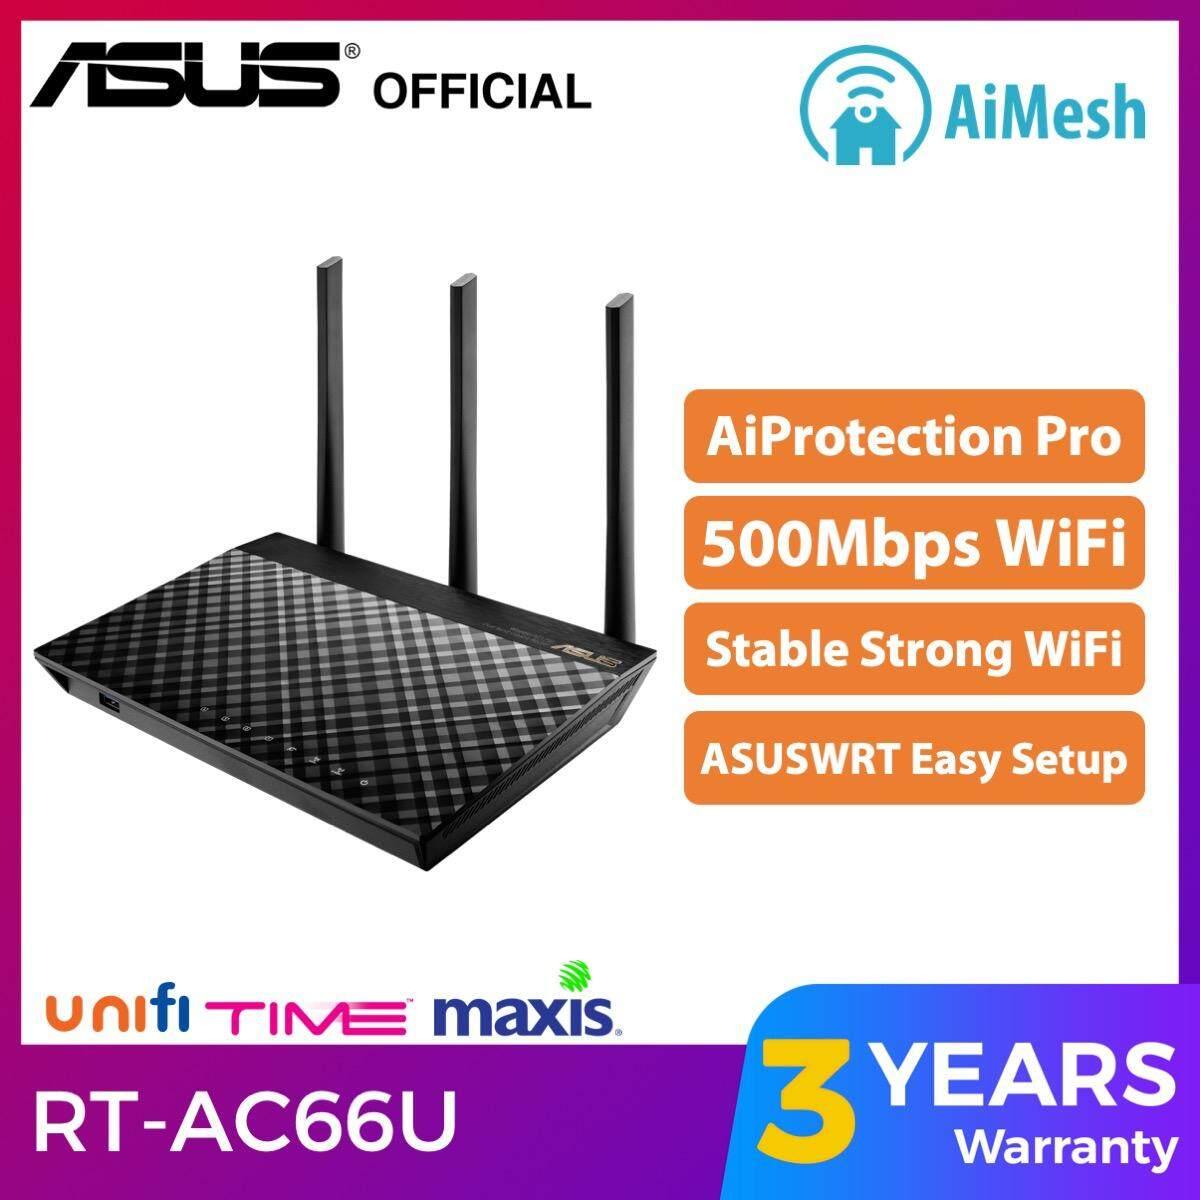 ASUS RT-AC66U AC1750 AiMesh WiFi Router AC for Unifi Wireless Router RT  AC66U B1